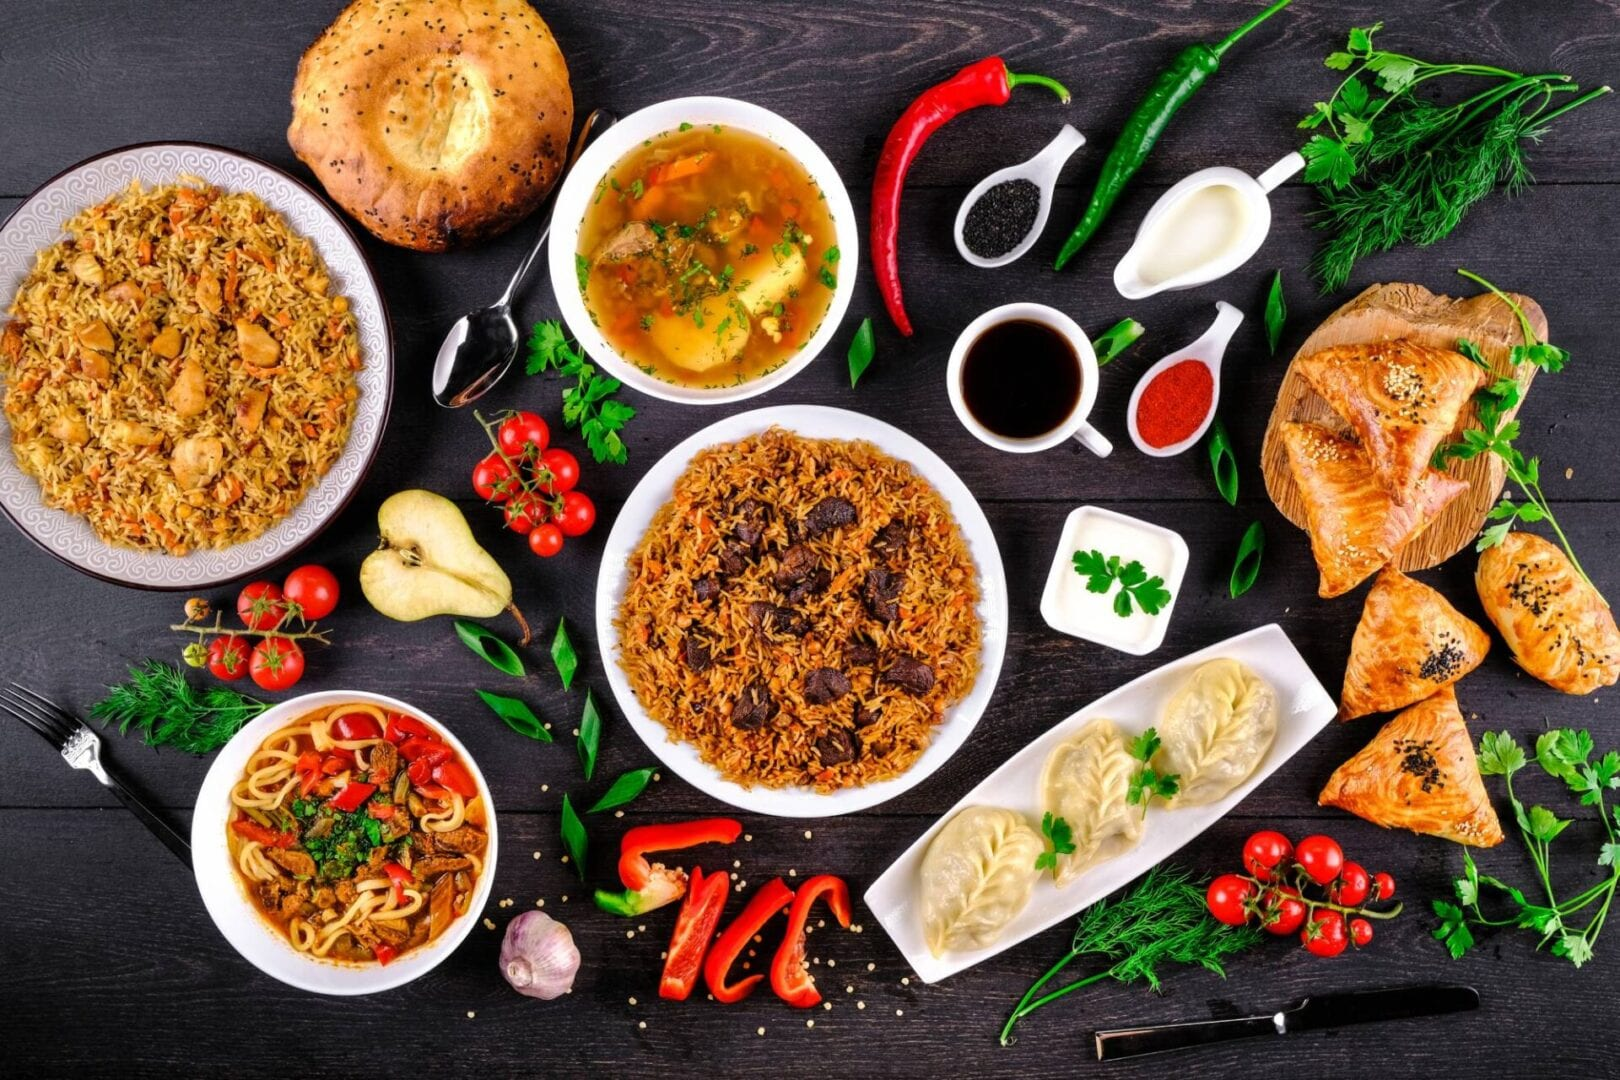 OSH Resturant & Grill